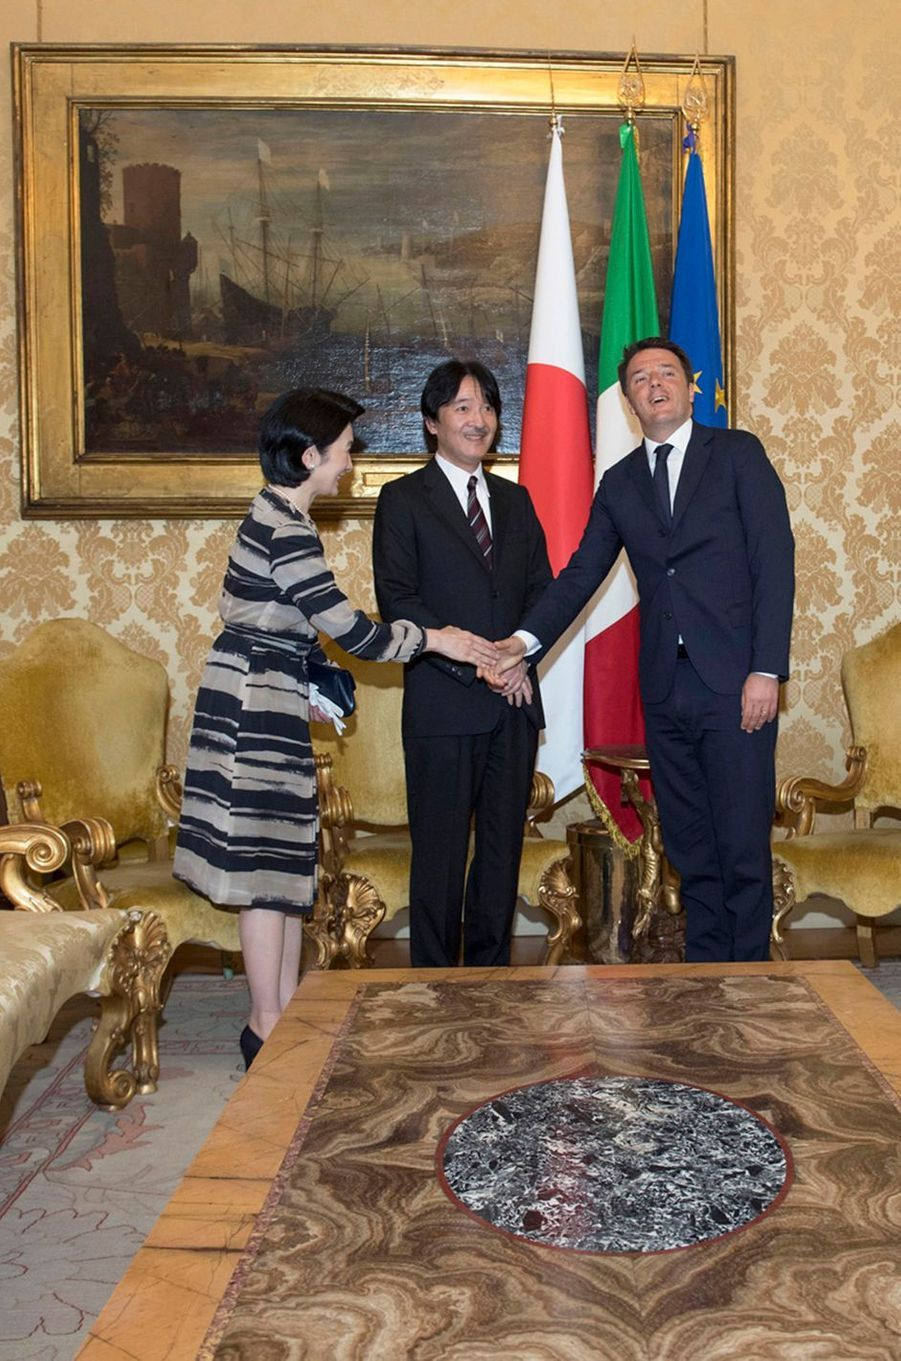 La princesse Kiko et le prince Akishino du Japon avec Matteo Renzi à Rome, le 11 mai 2016